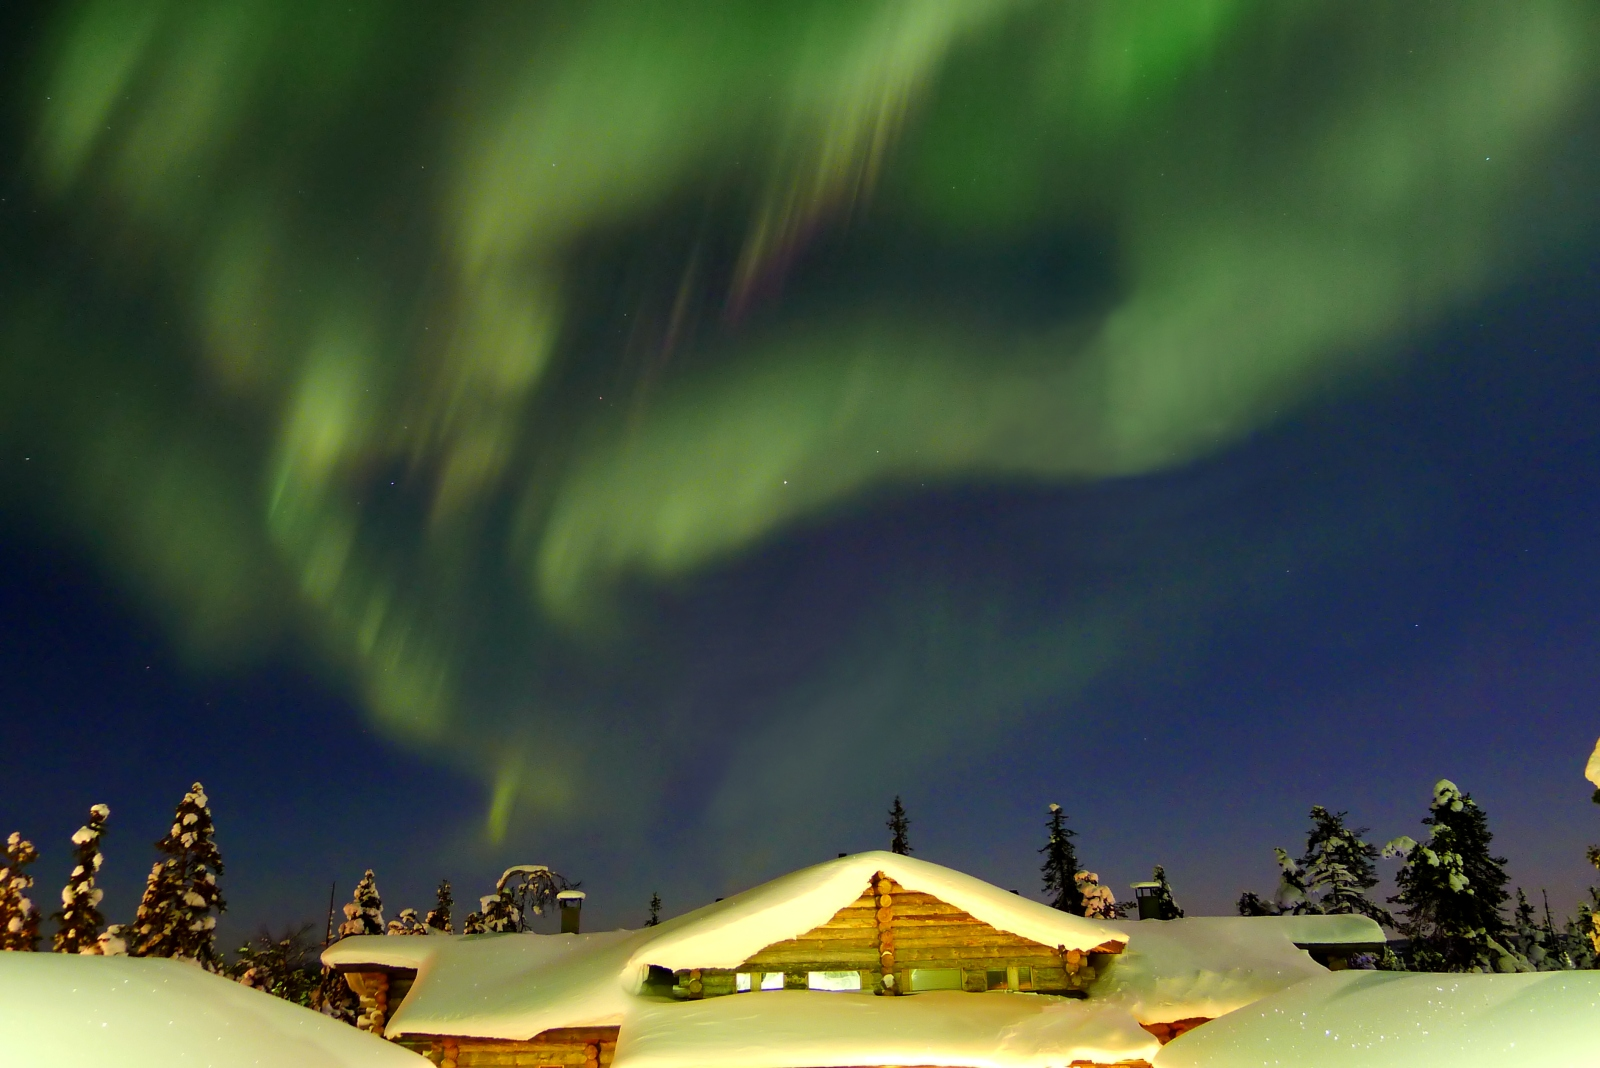 Northern lights in Finland, winter